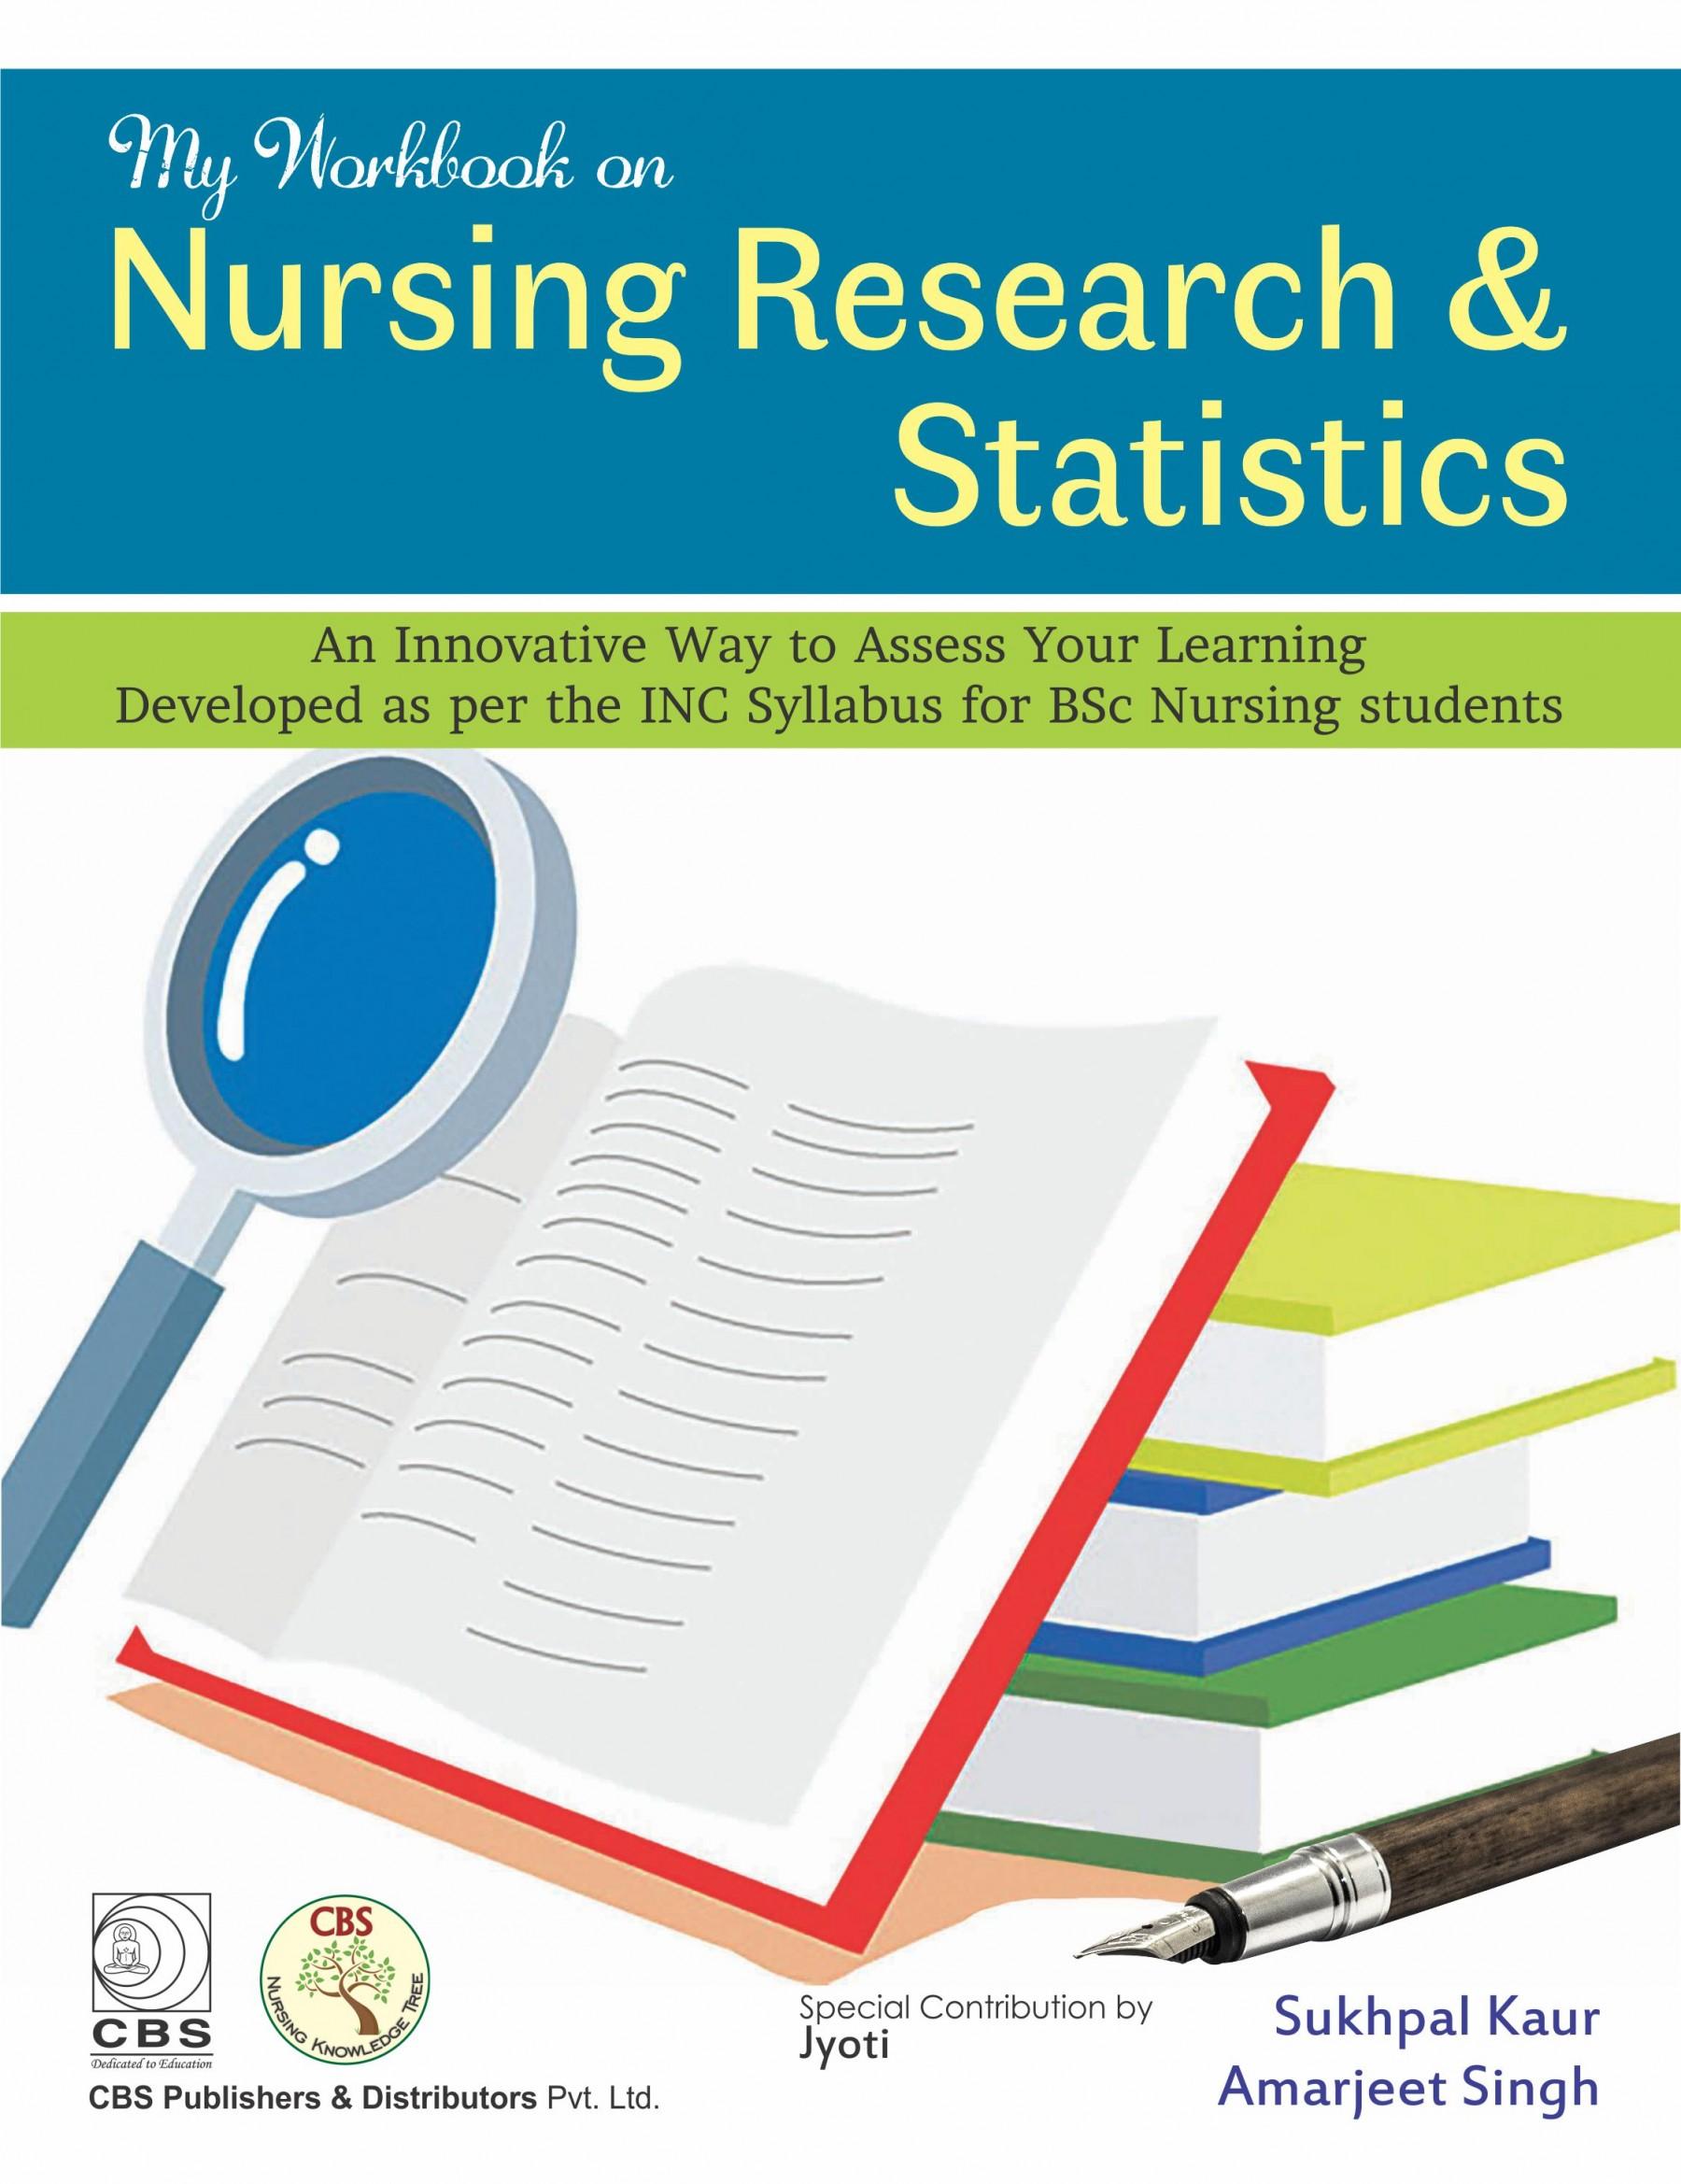 My Workbook on Nursing Research & Statistics